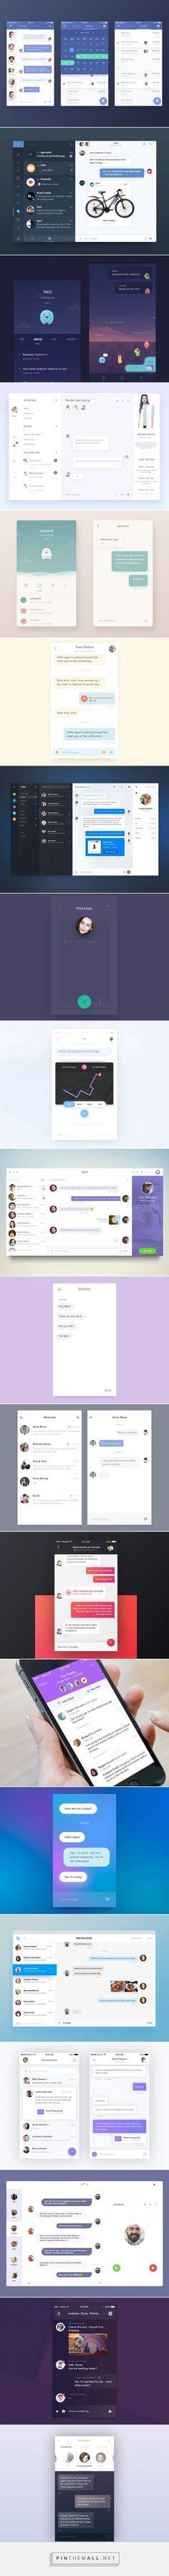 Chat/Messaging UI Inspiration — Muzli -Design Inspiration — Medium - created via https://pinthemall.net